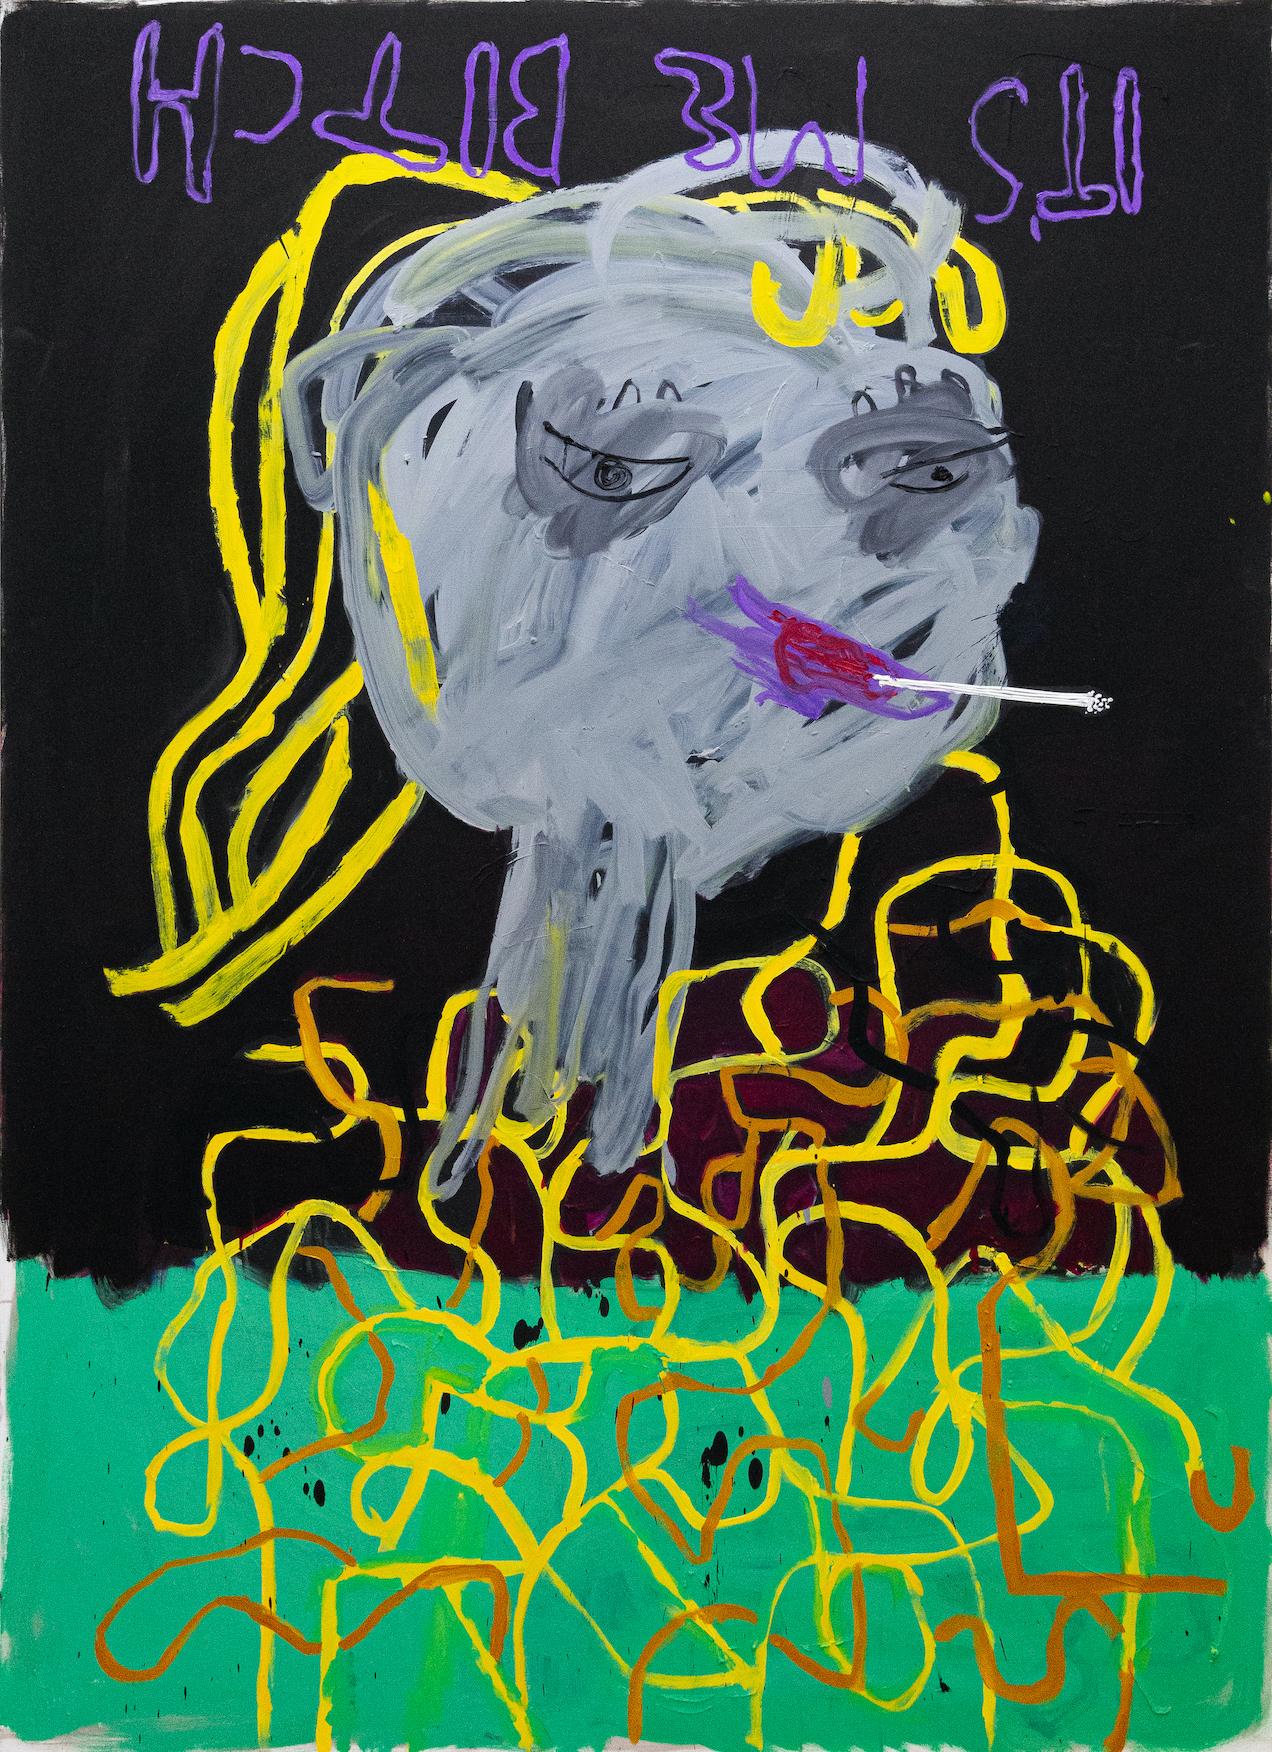 Boban Andjelkovic, Untitled (I paint for Dora), 2020, oil on canvas, 220 x 160 cm, BA/M 25